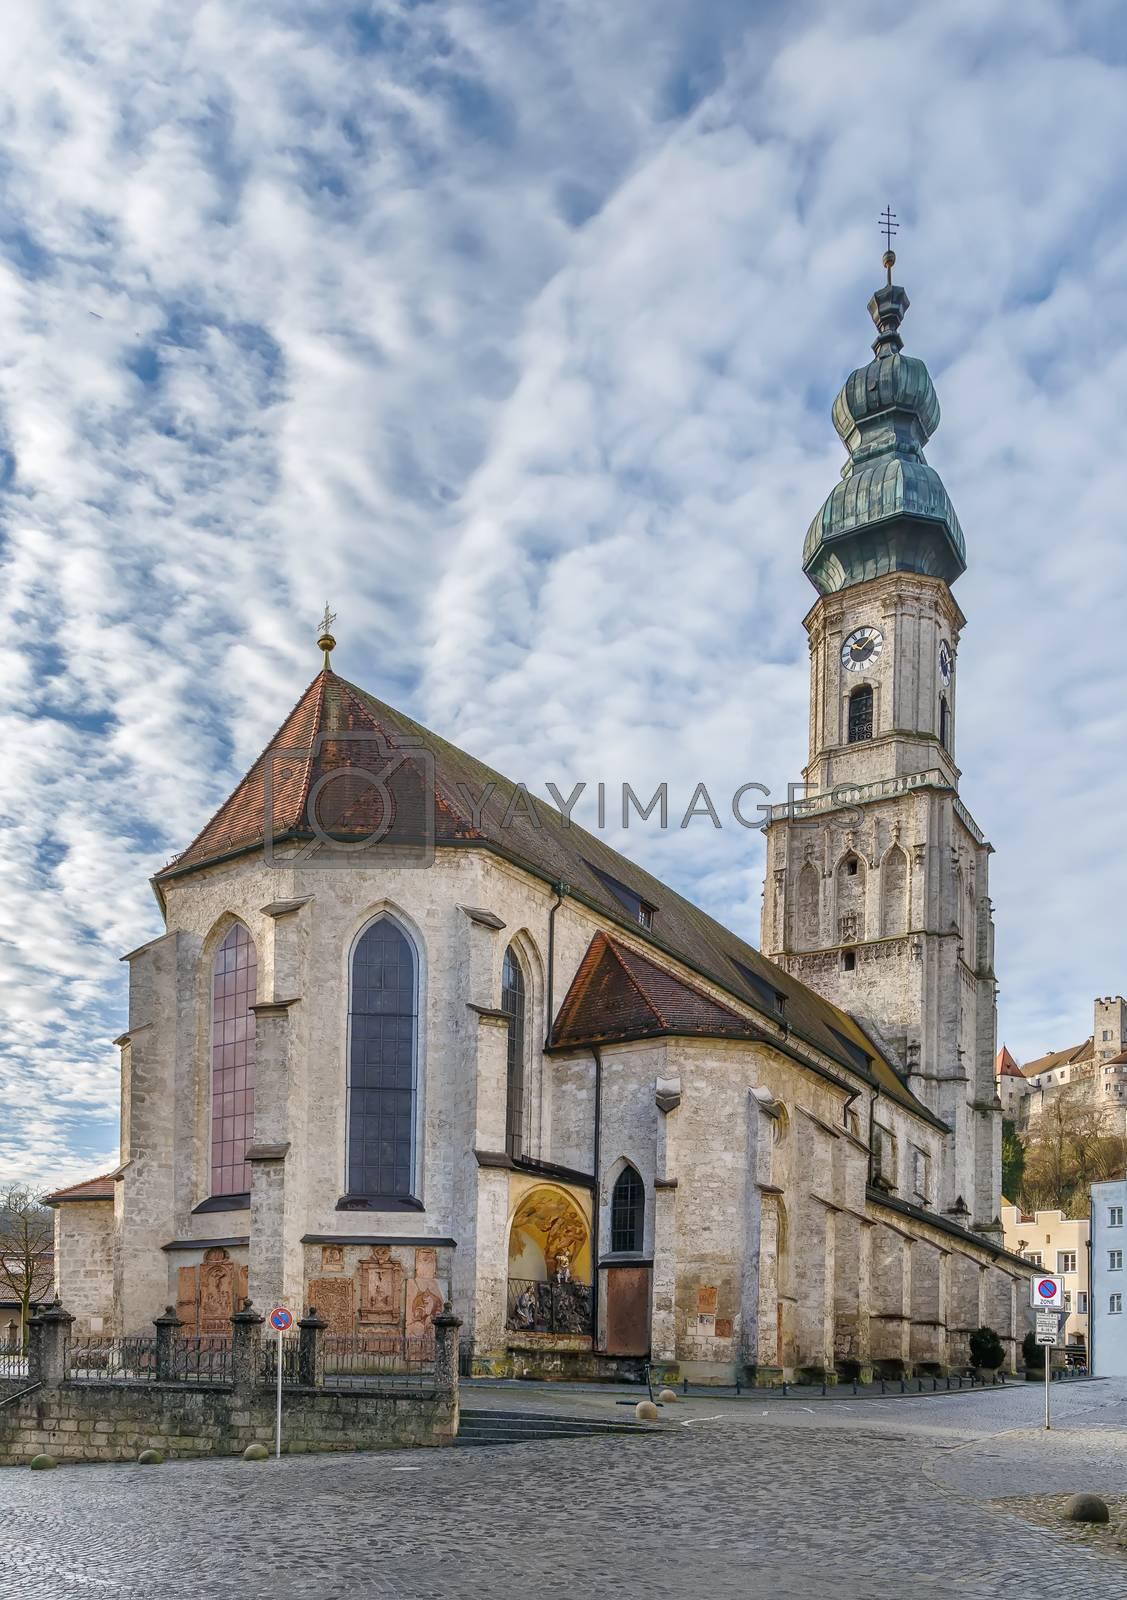 St. Jakob Parish Church in Burghausen, Upper Bavaria, Germany